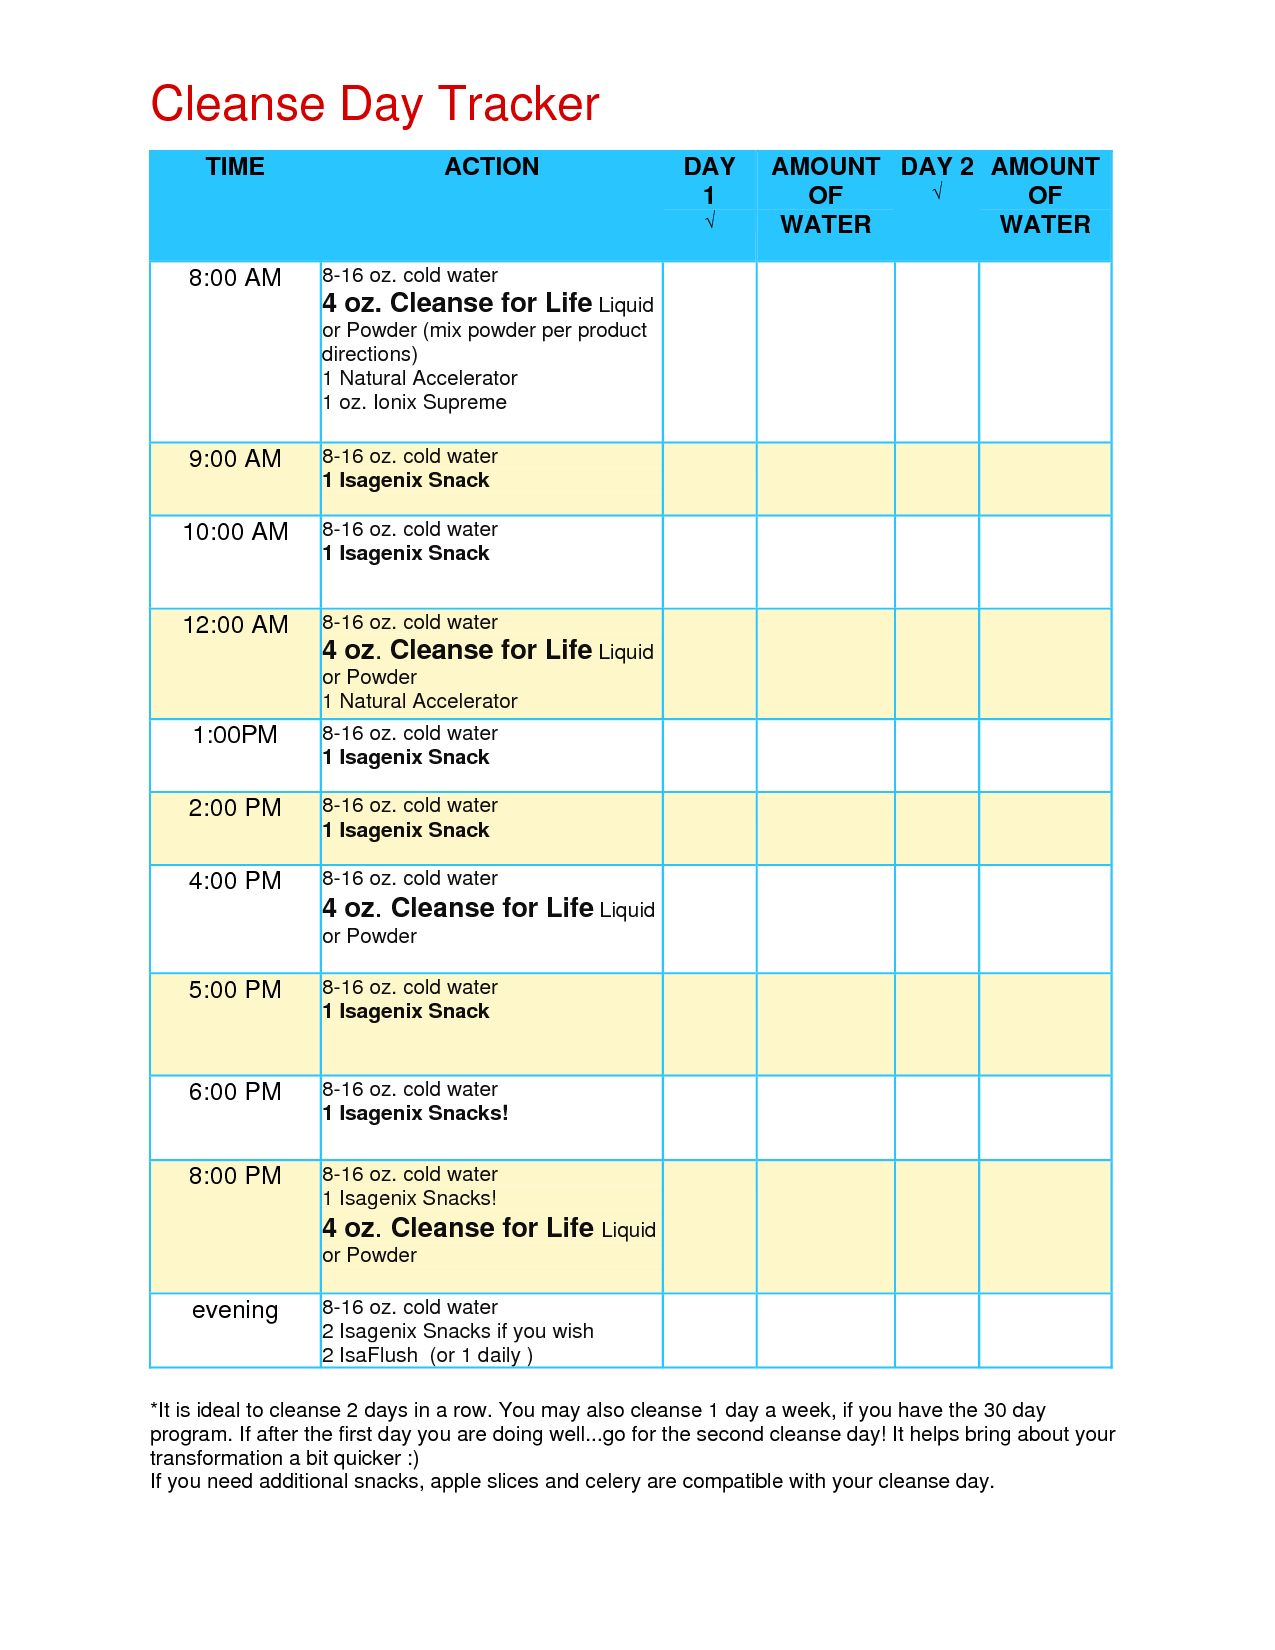 Cleanse Day Tracker   Isagenix Cleanse, Isagenix Snacks Inside Isagenix Cleanse Day Schedule Printable